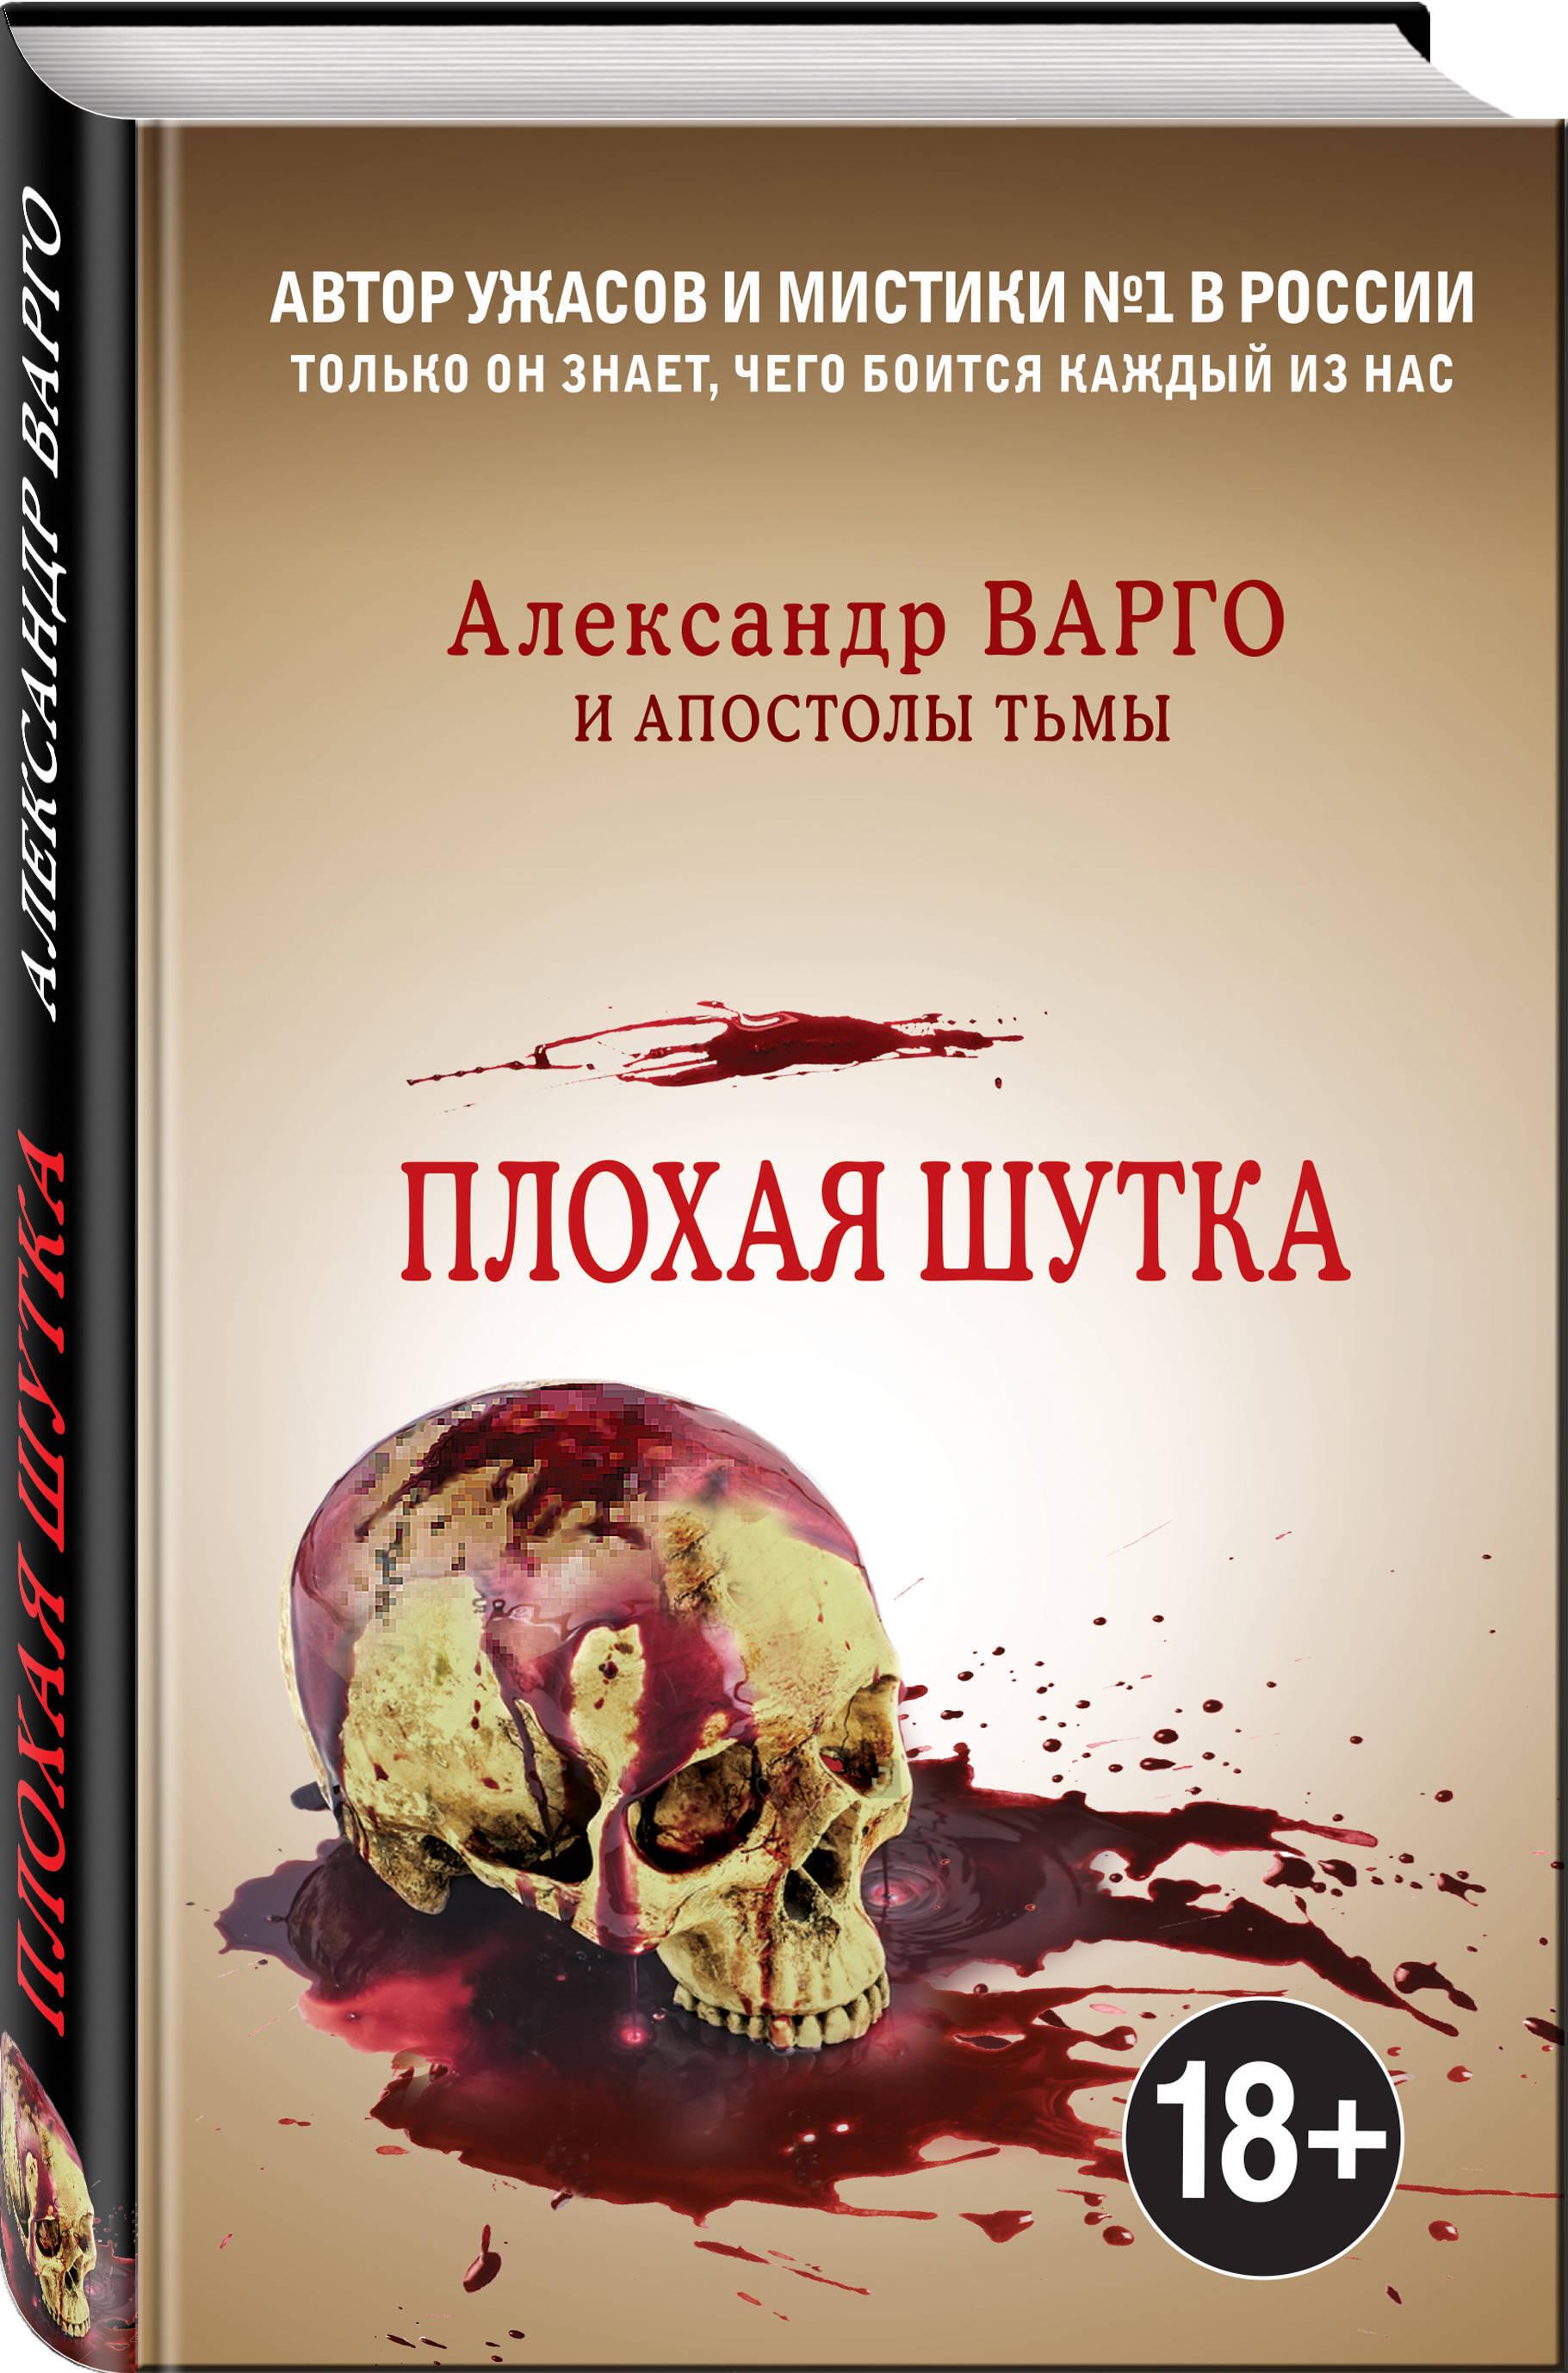 Плохая шутка | Варго Александр, Миронов Иван Борисович